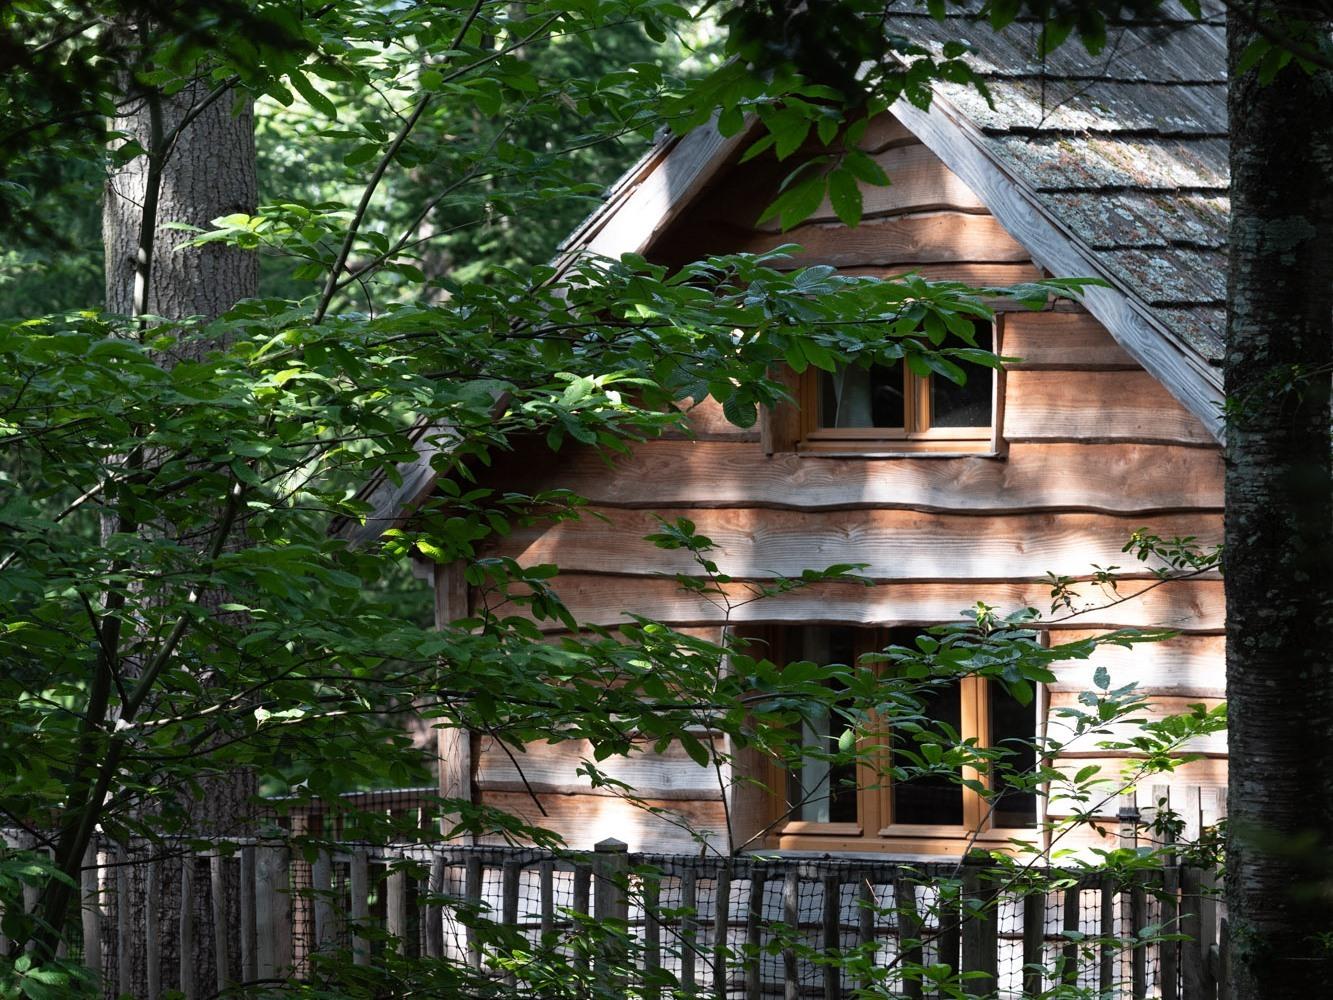 Cabine-de Luxe-Salle de bain partagée-Terrasse-Cabane PANDA Insolite